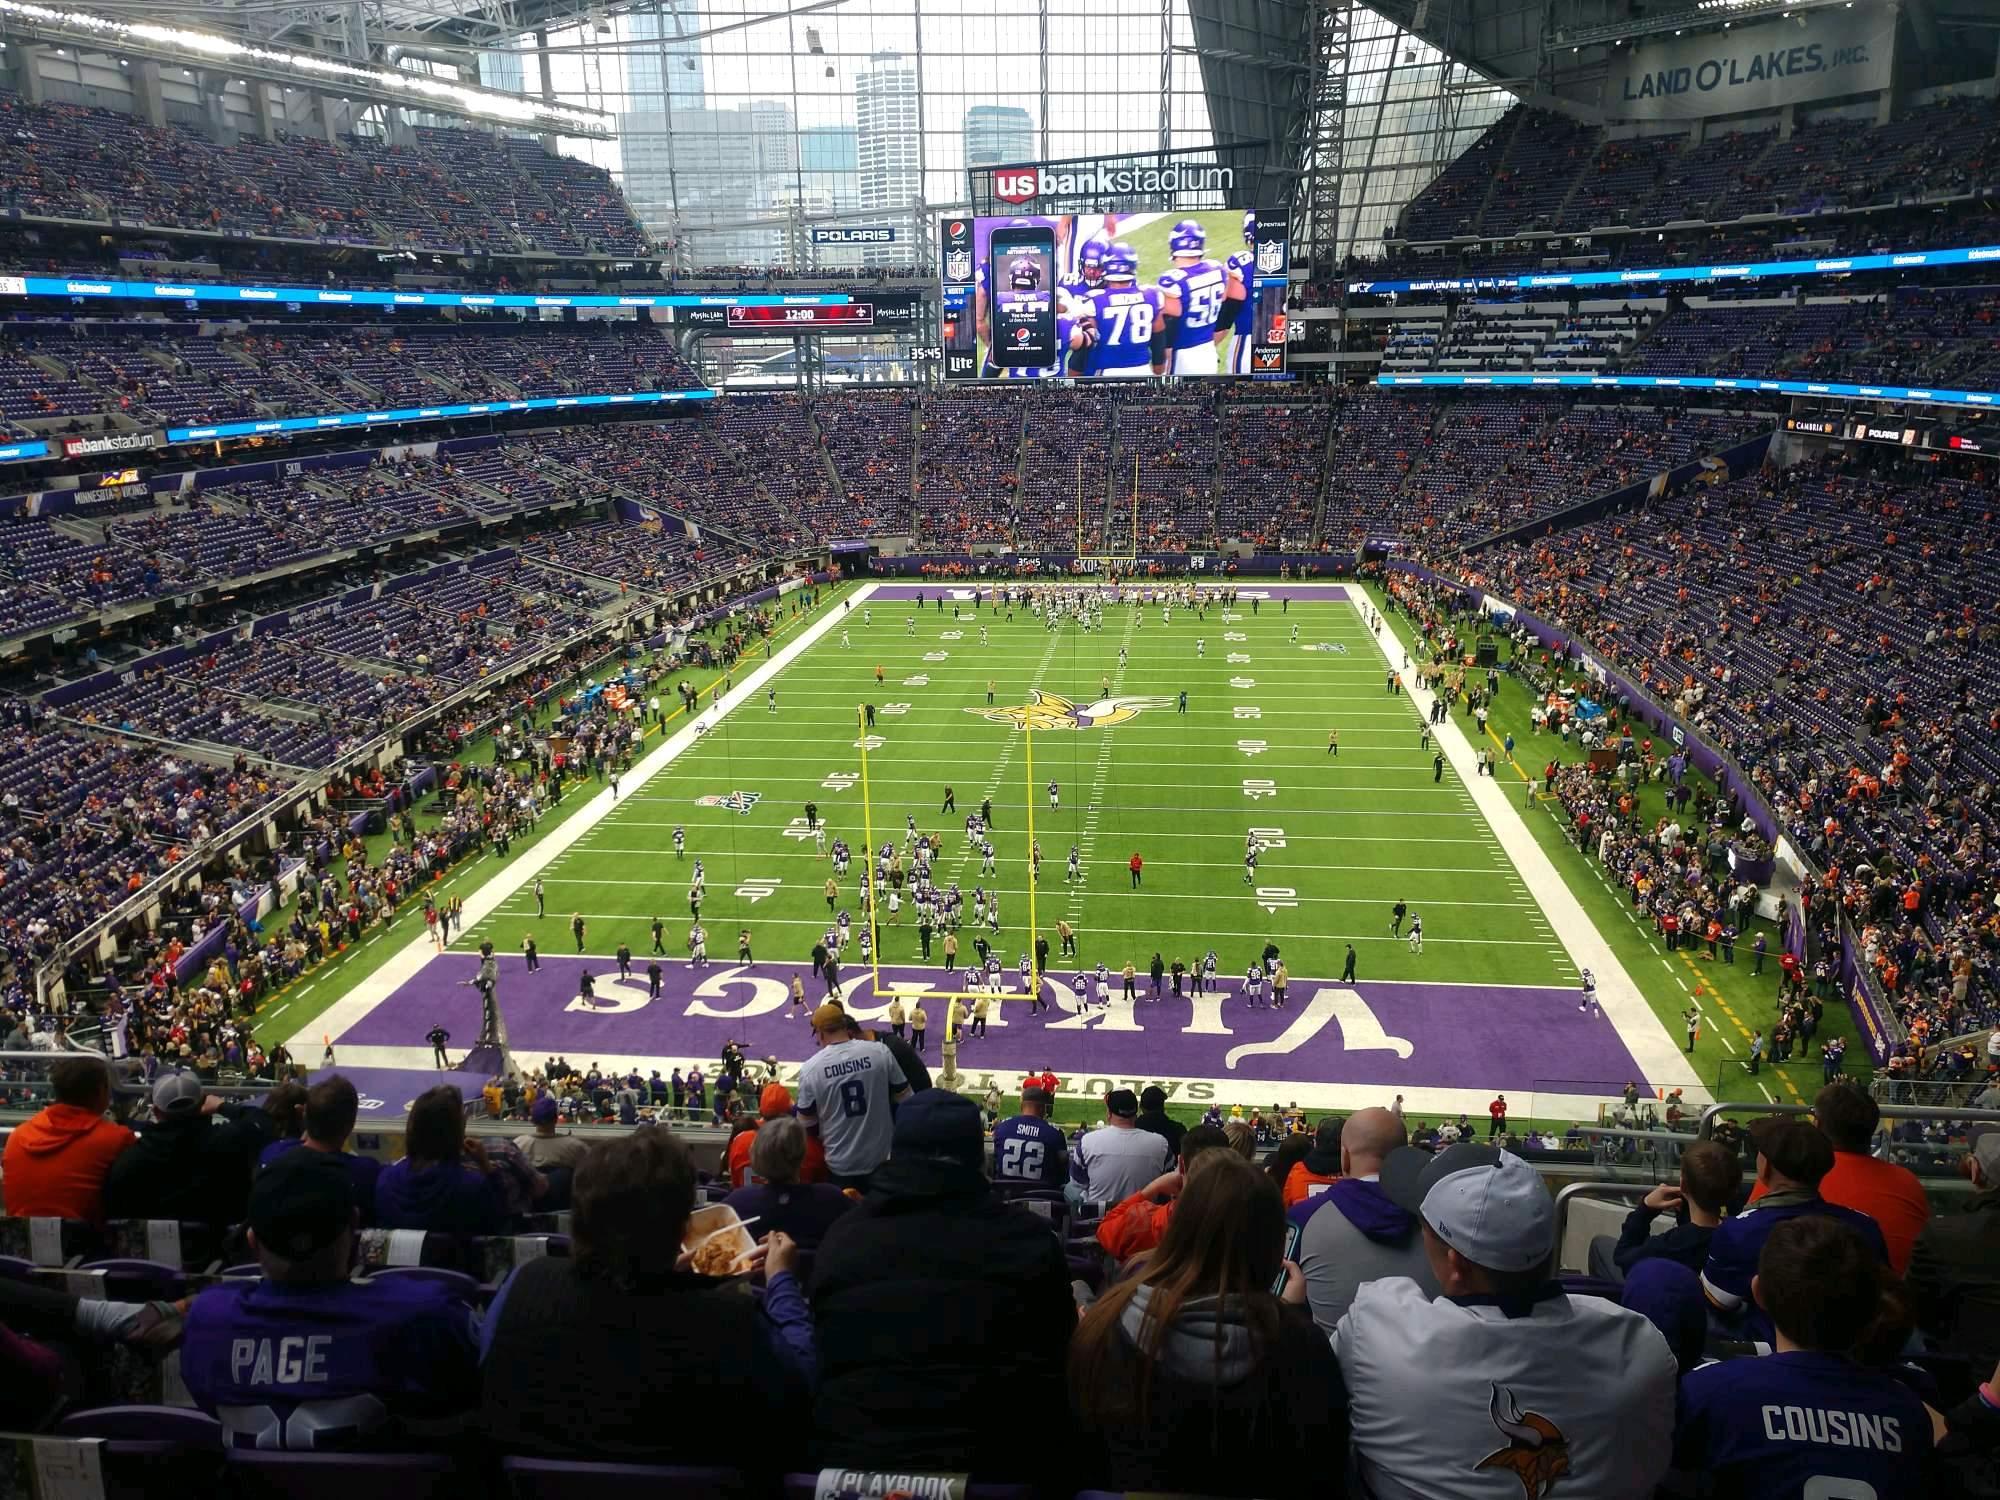 U.S. Bank Stadium Section 223 Row 12 Seat 6